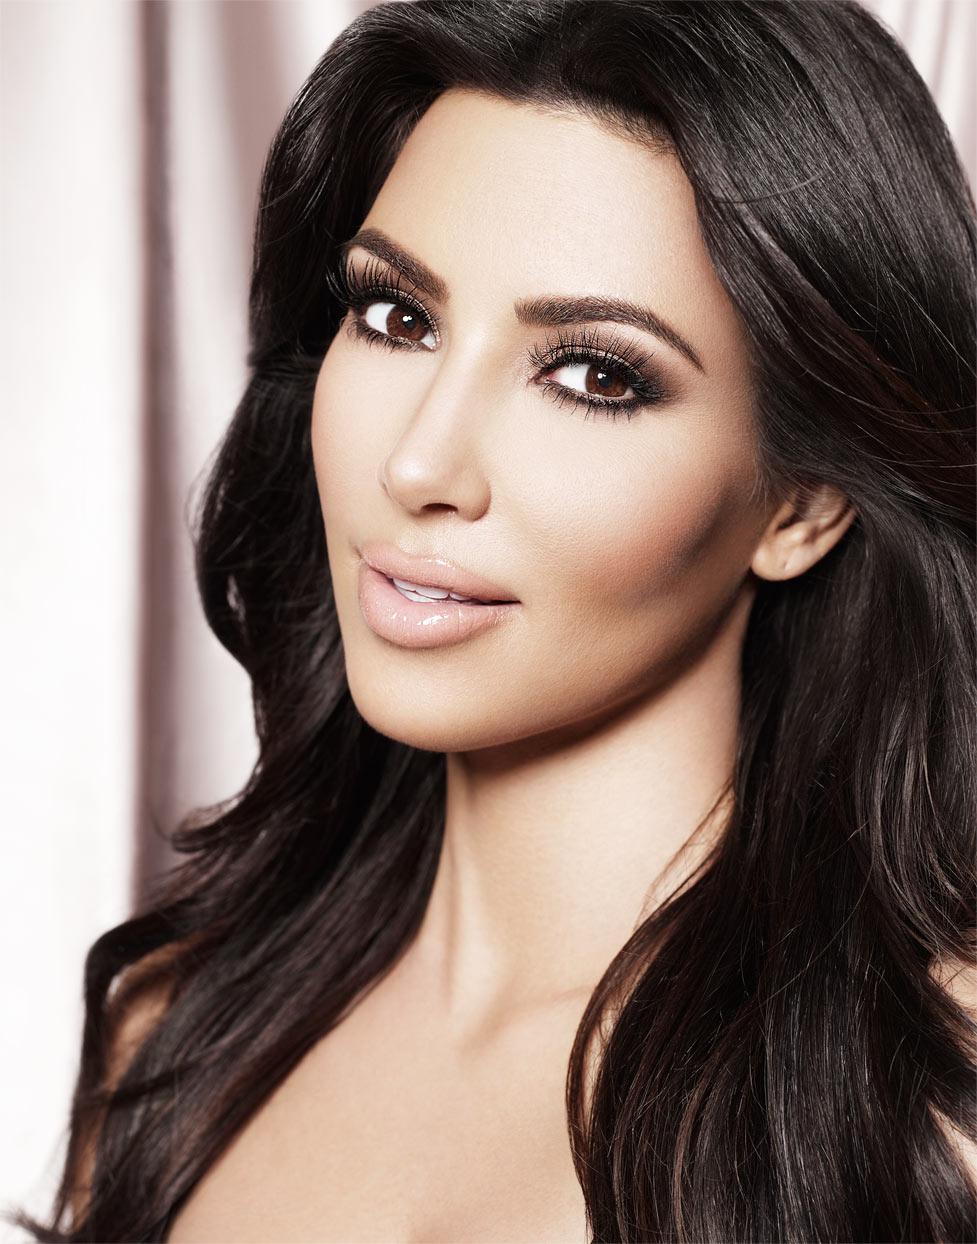 Mark DeLong - Celebrity Photographer - Profile photo of Kim Kardashian.